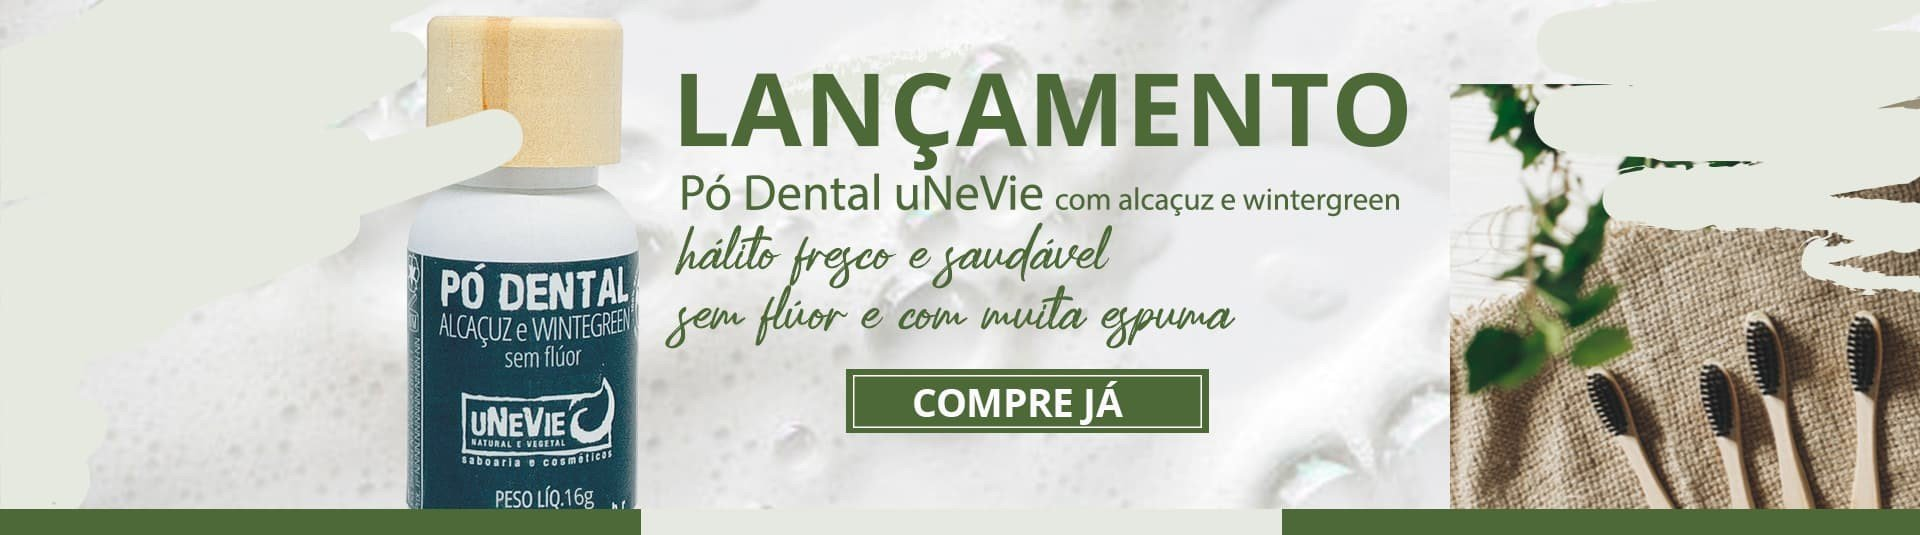 LR 2020-09-08 Po dental lançamento